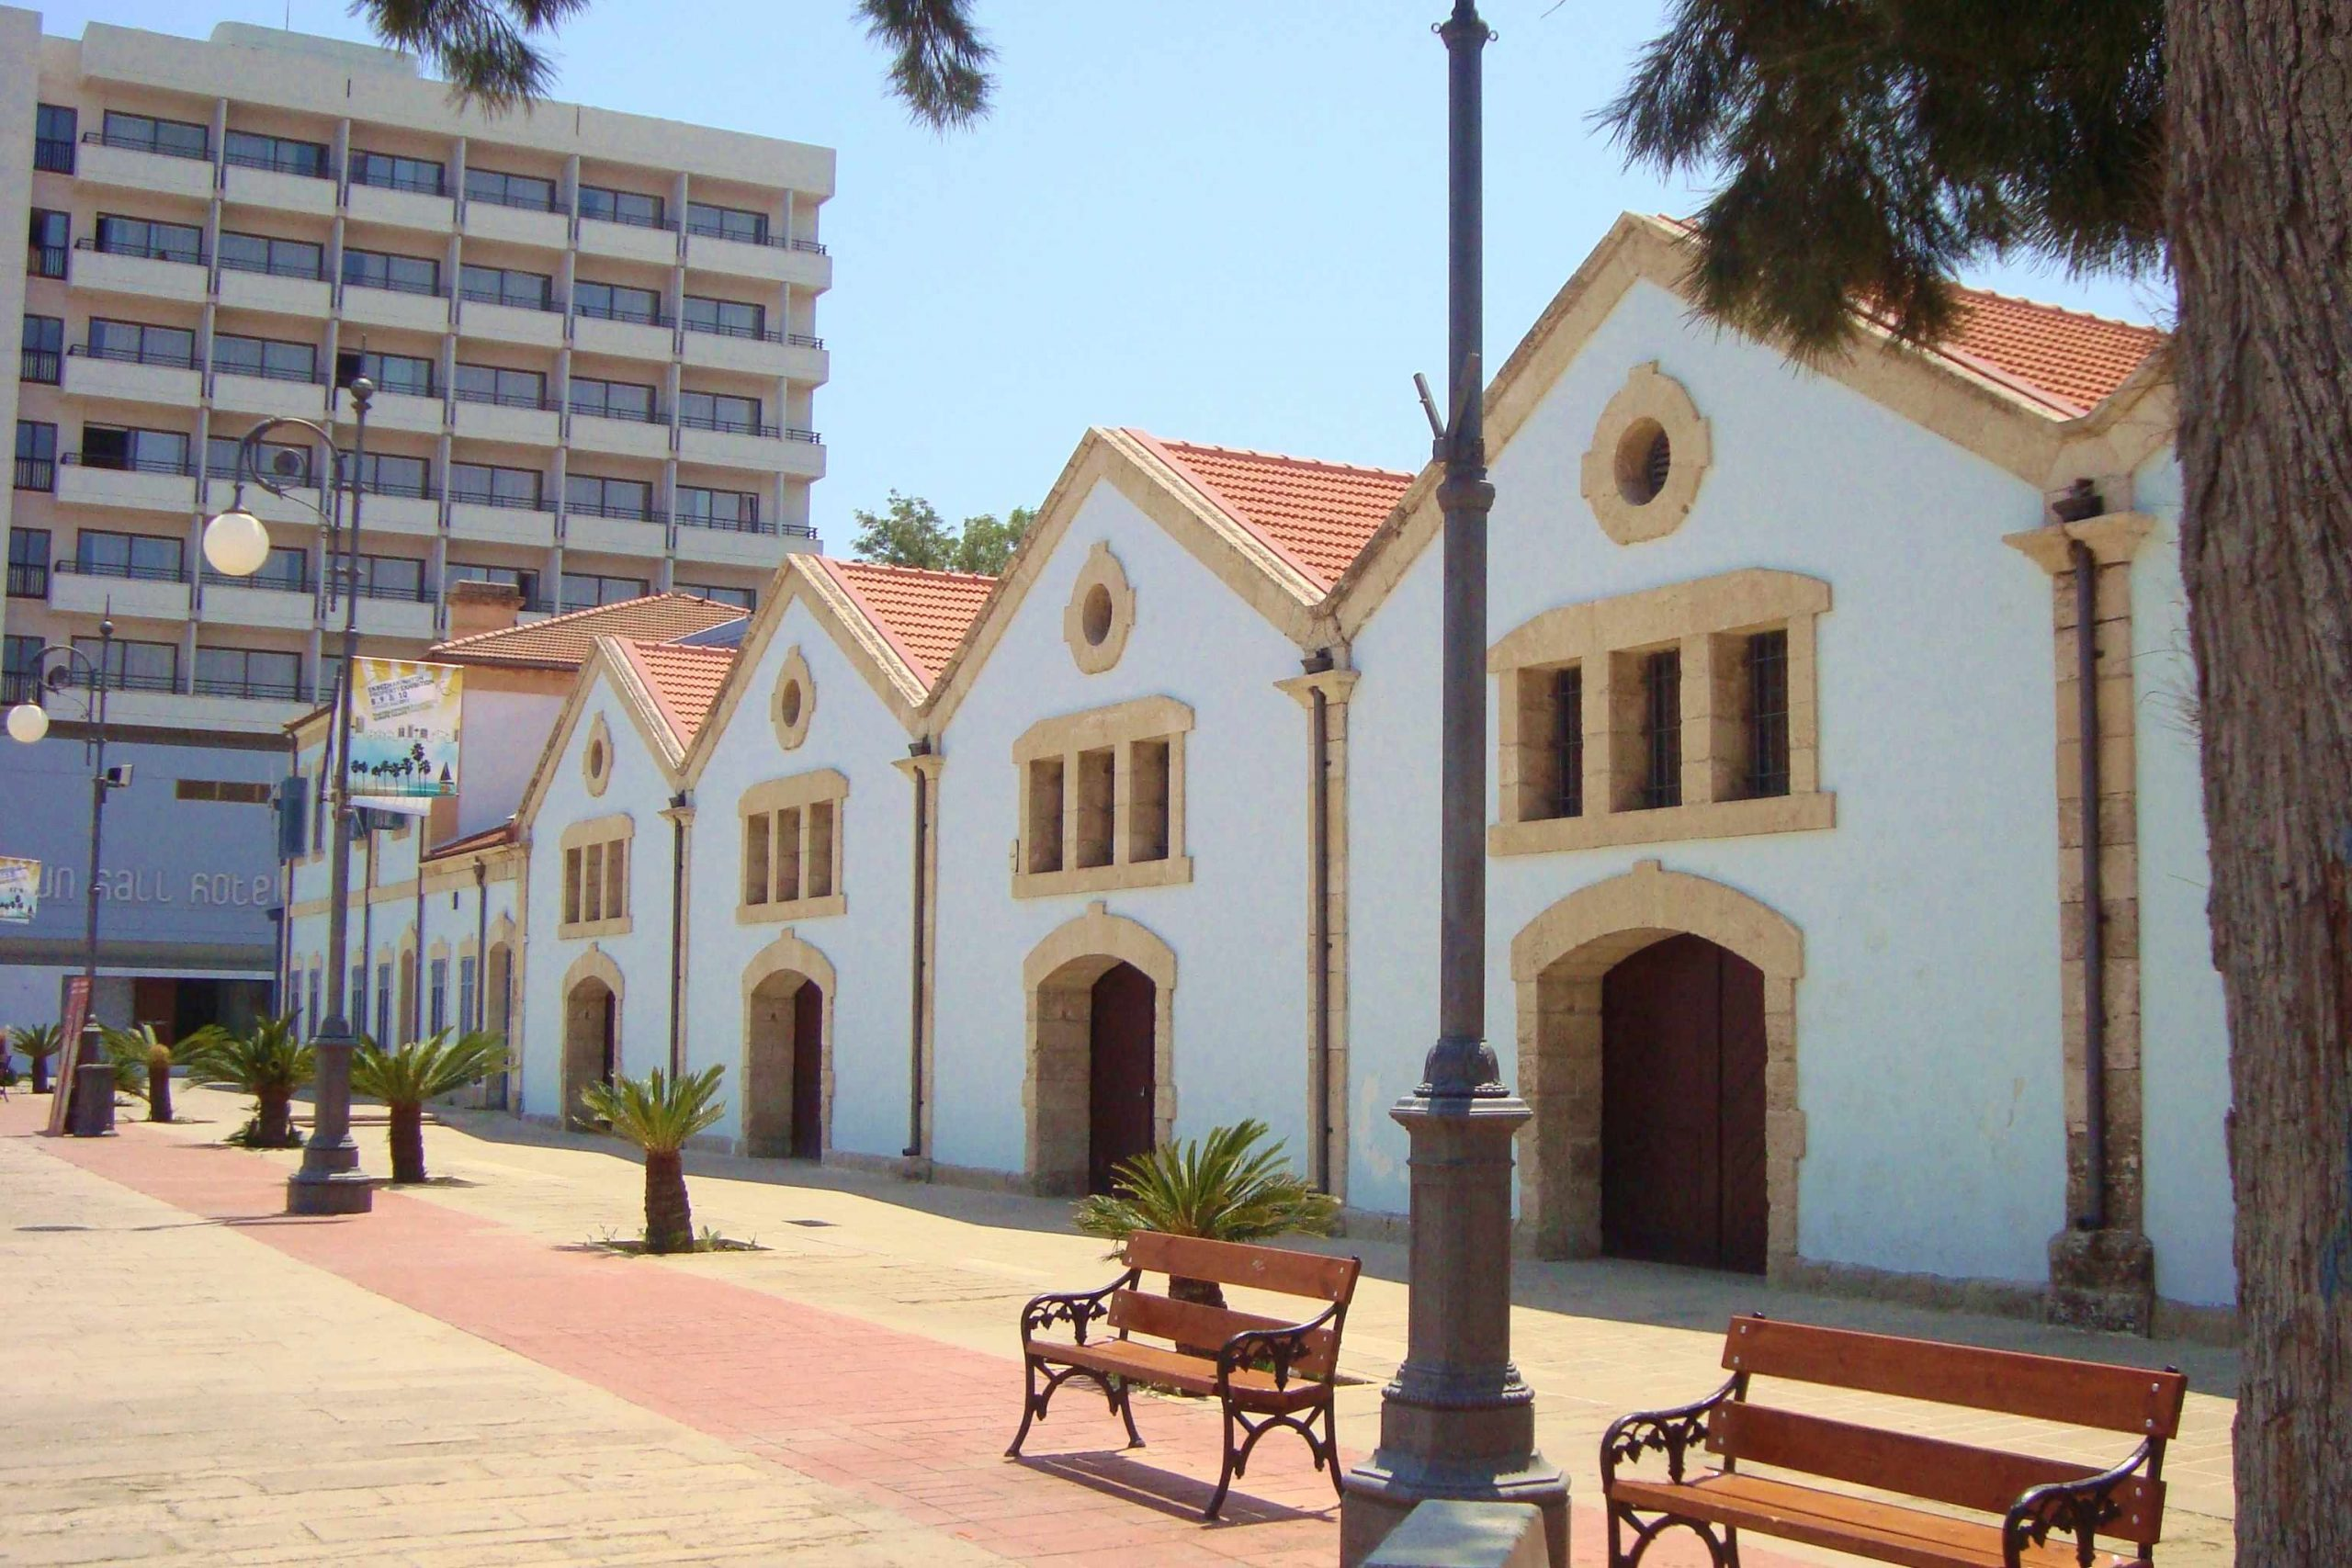 europe-square-in-larnaca-republic-of-cyprusjpg